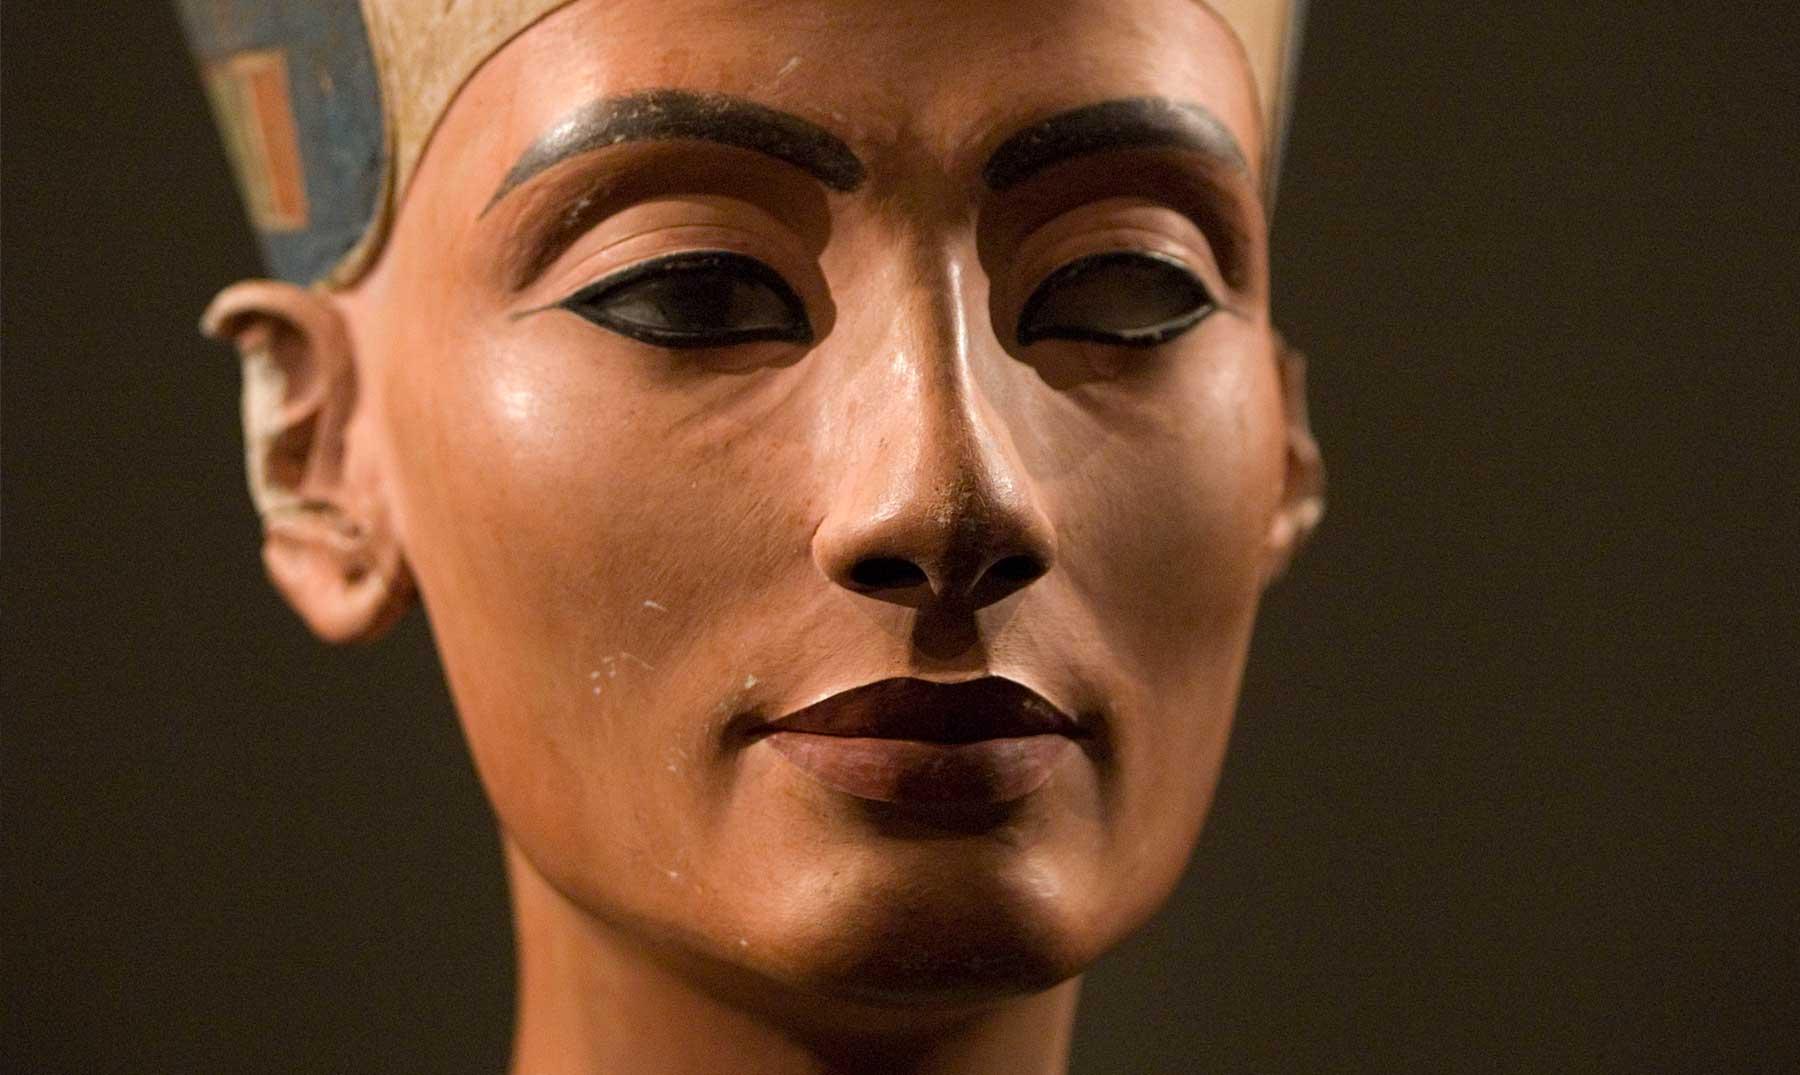 La bella y enigmática reina Nefertiti